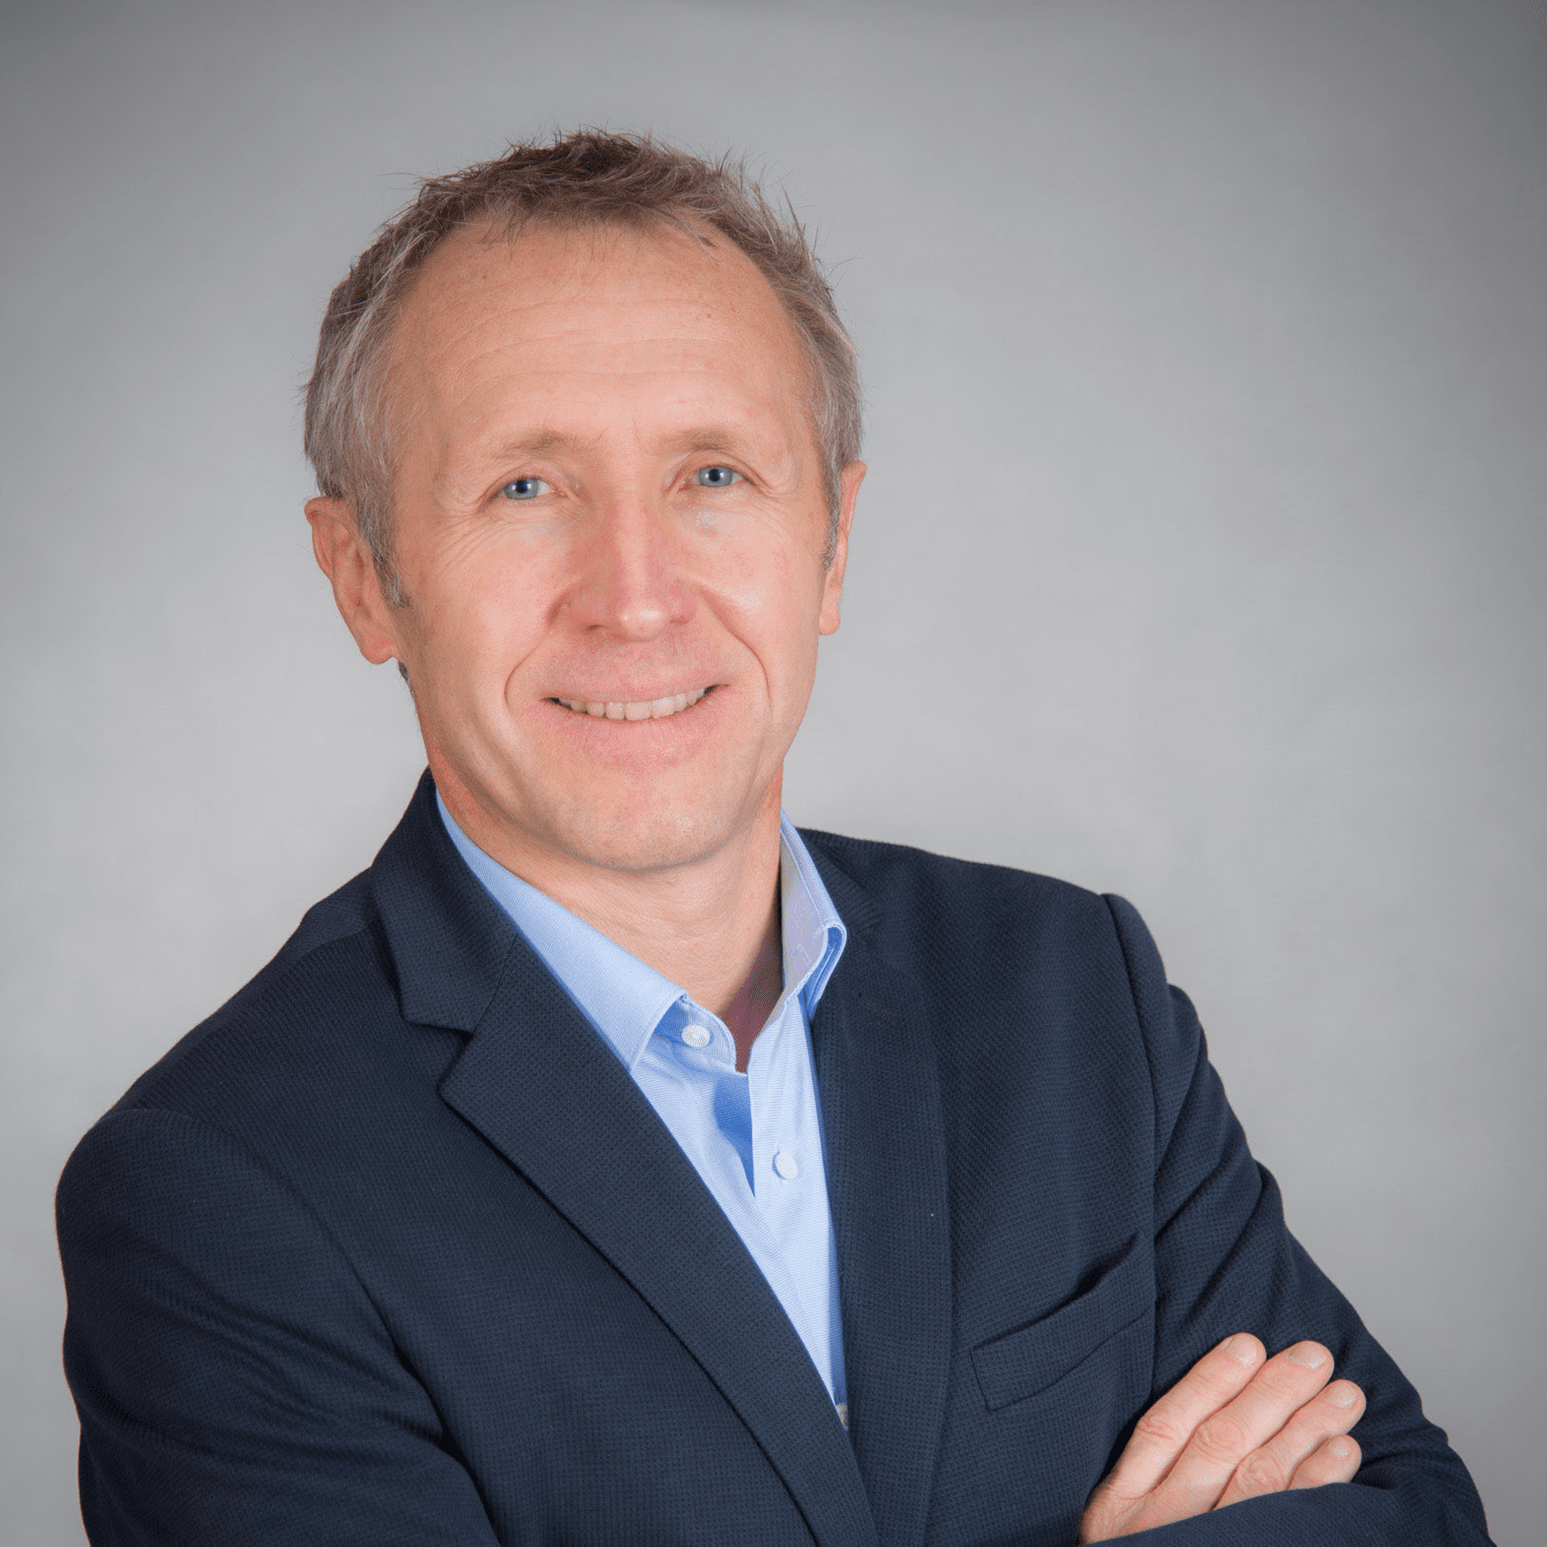 Docteur POITTEVIN Gilles